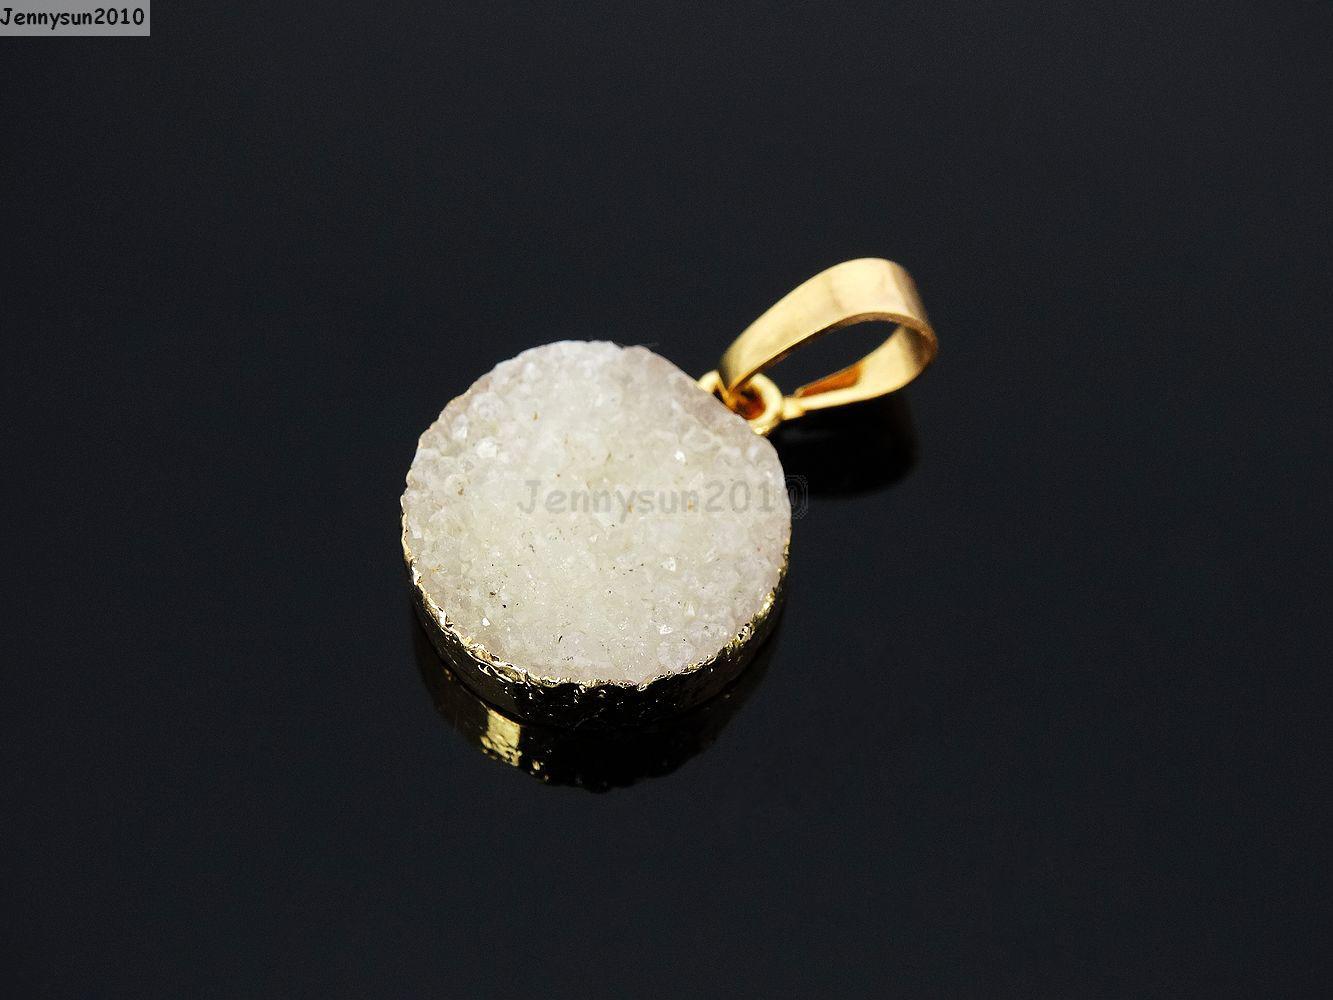 Natural Druzy Quartz Agate Round Pendant Gold Edge Charm